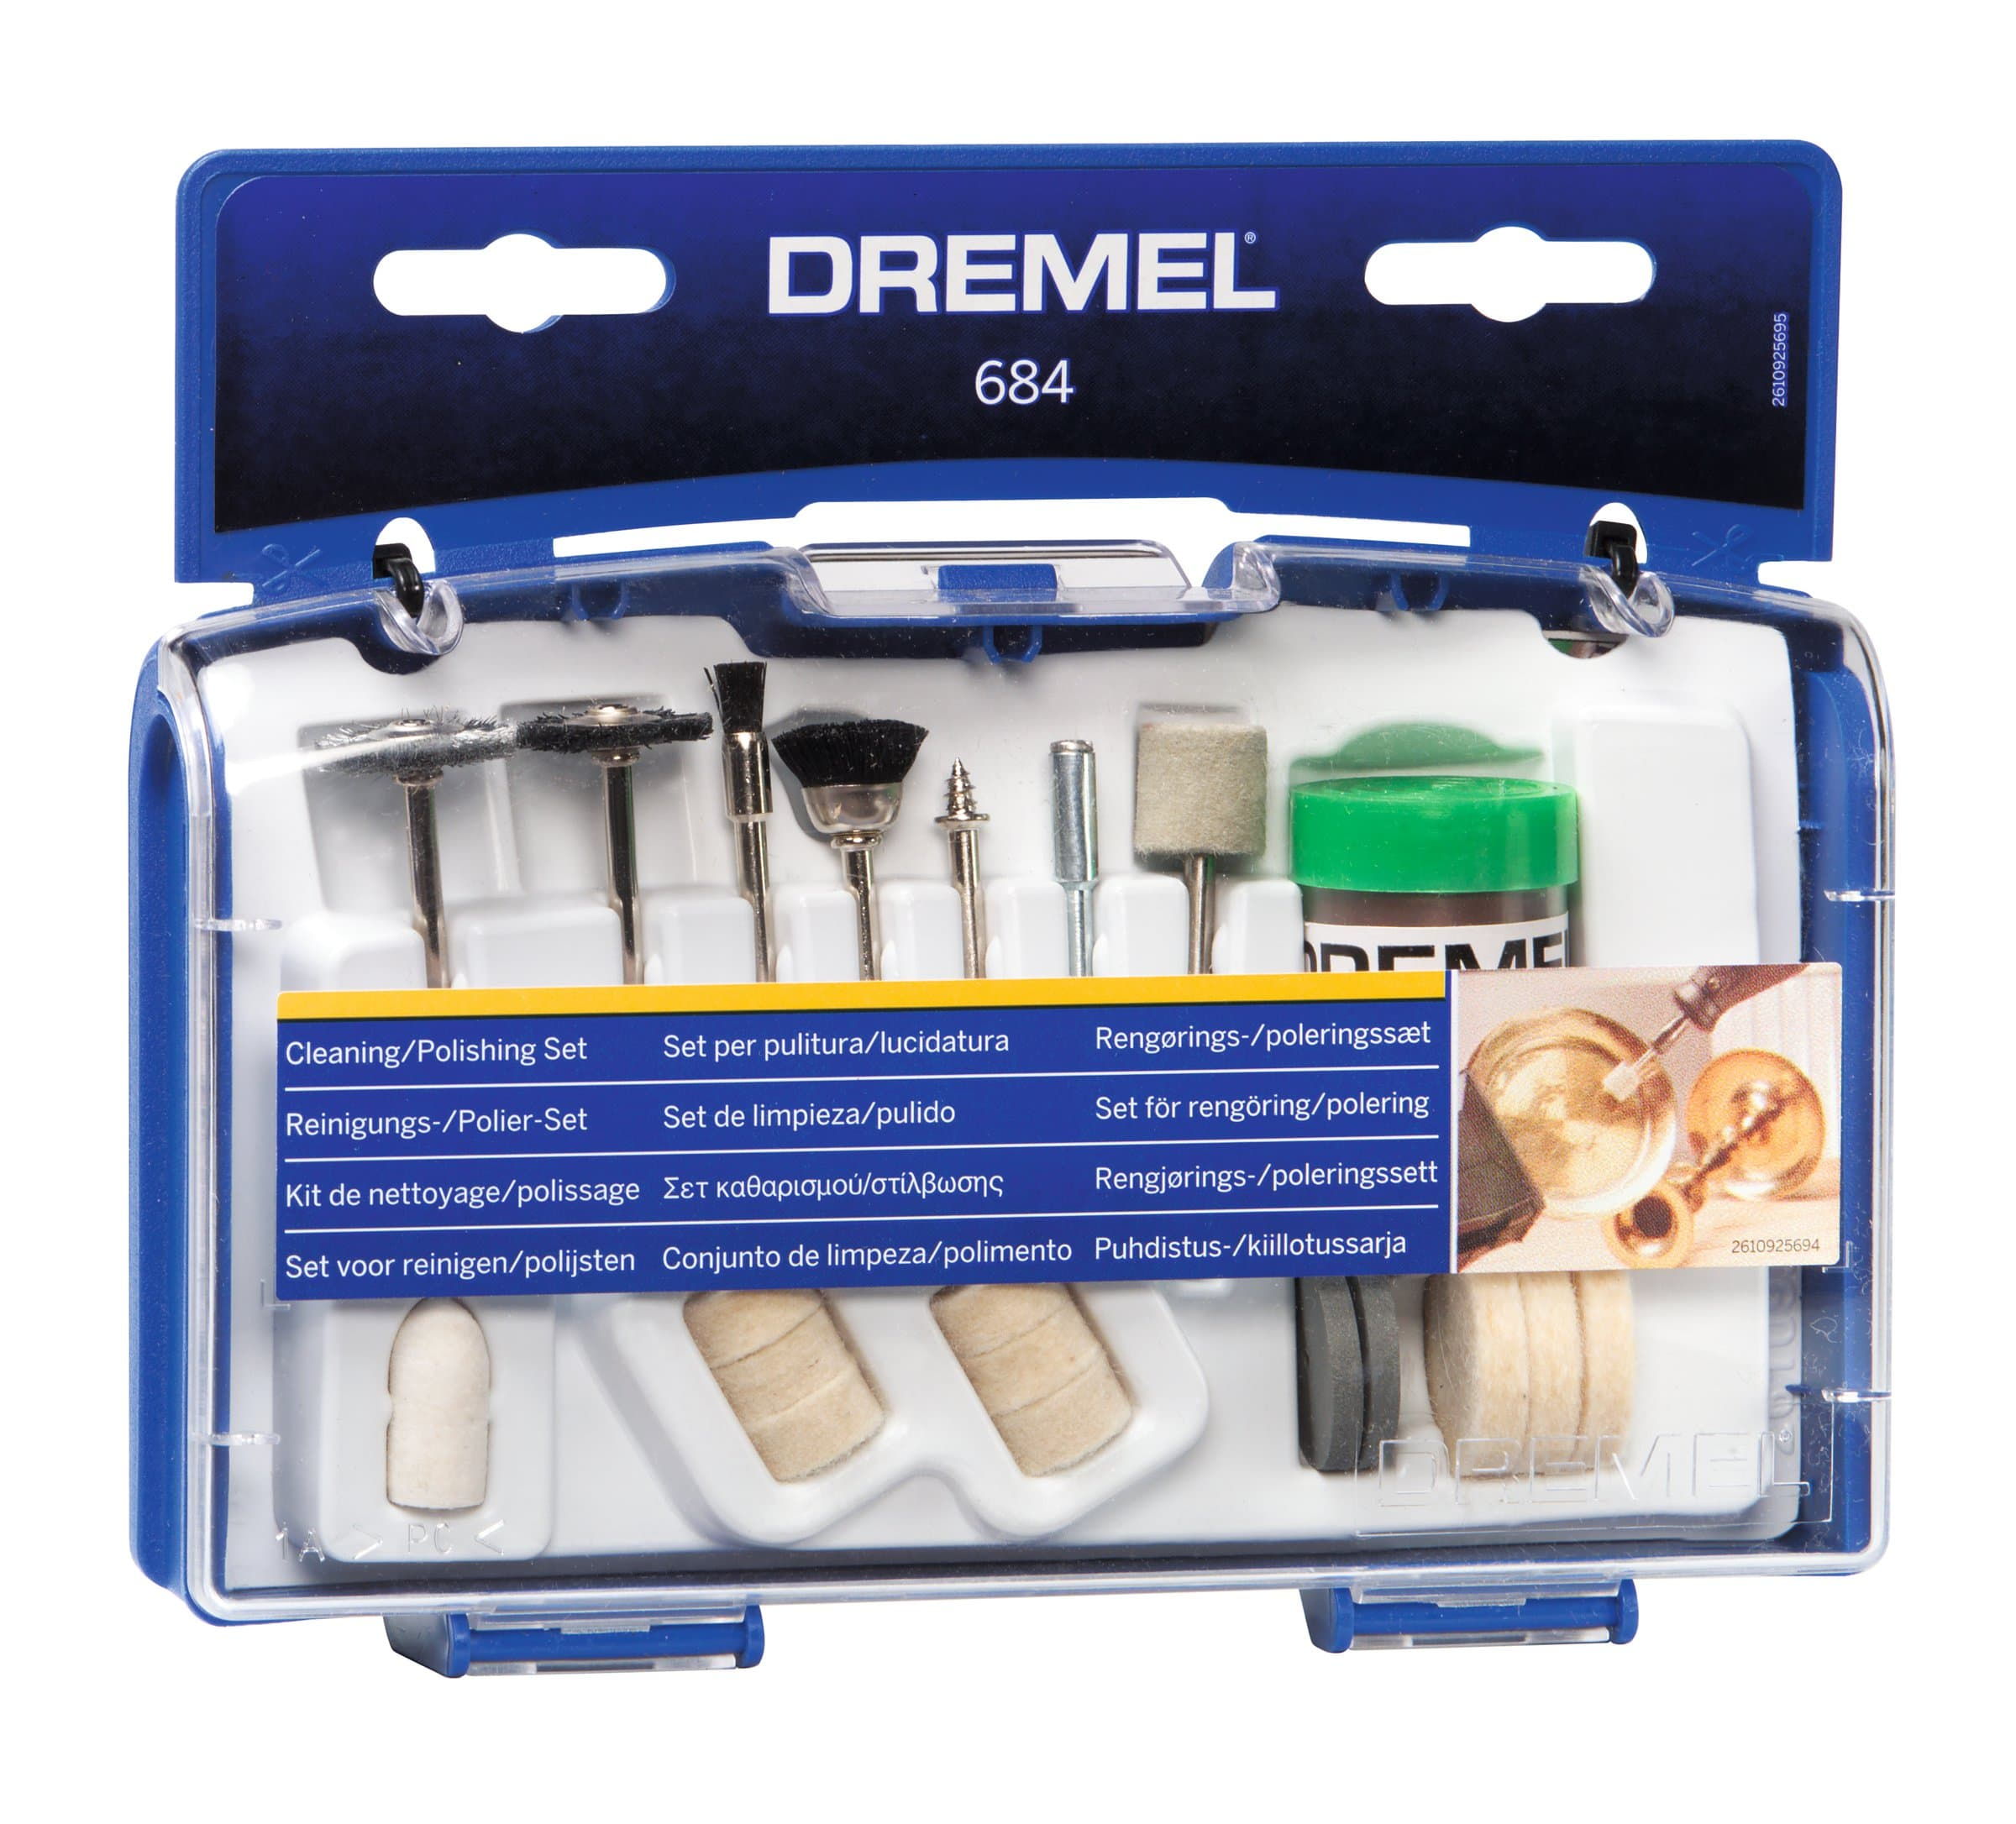 Dremel Polier-Set 20-tlg. (684)